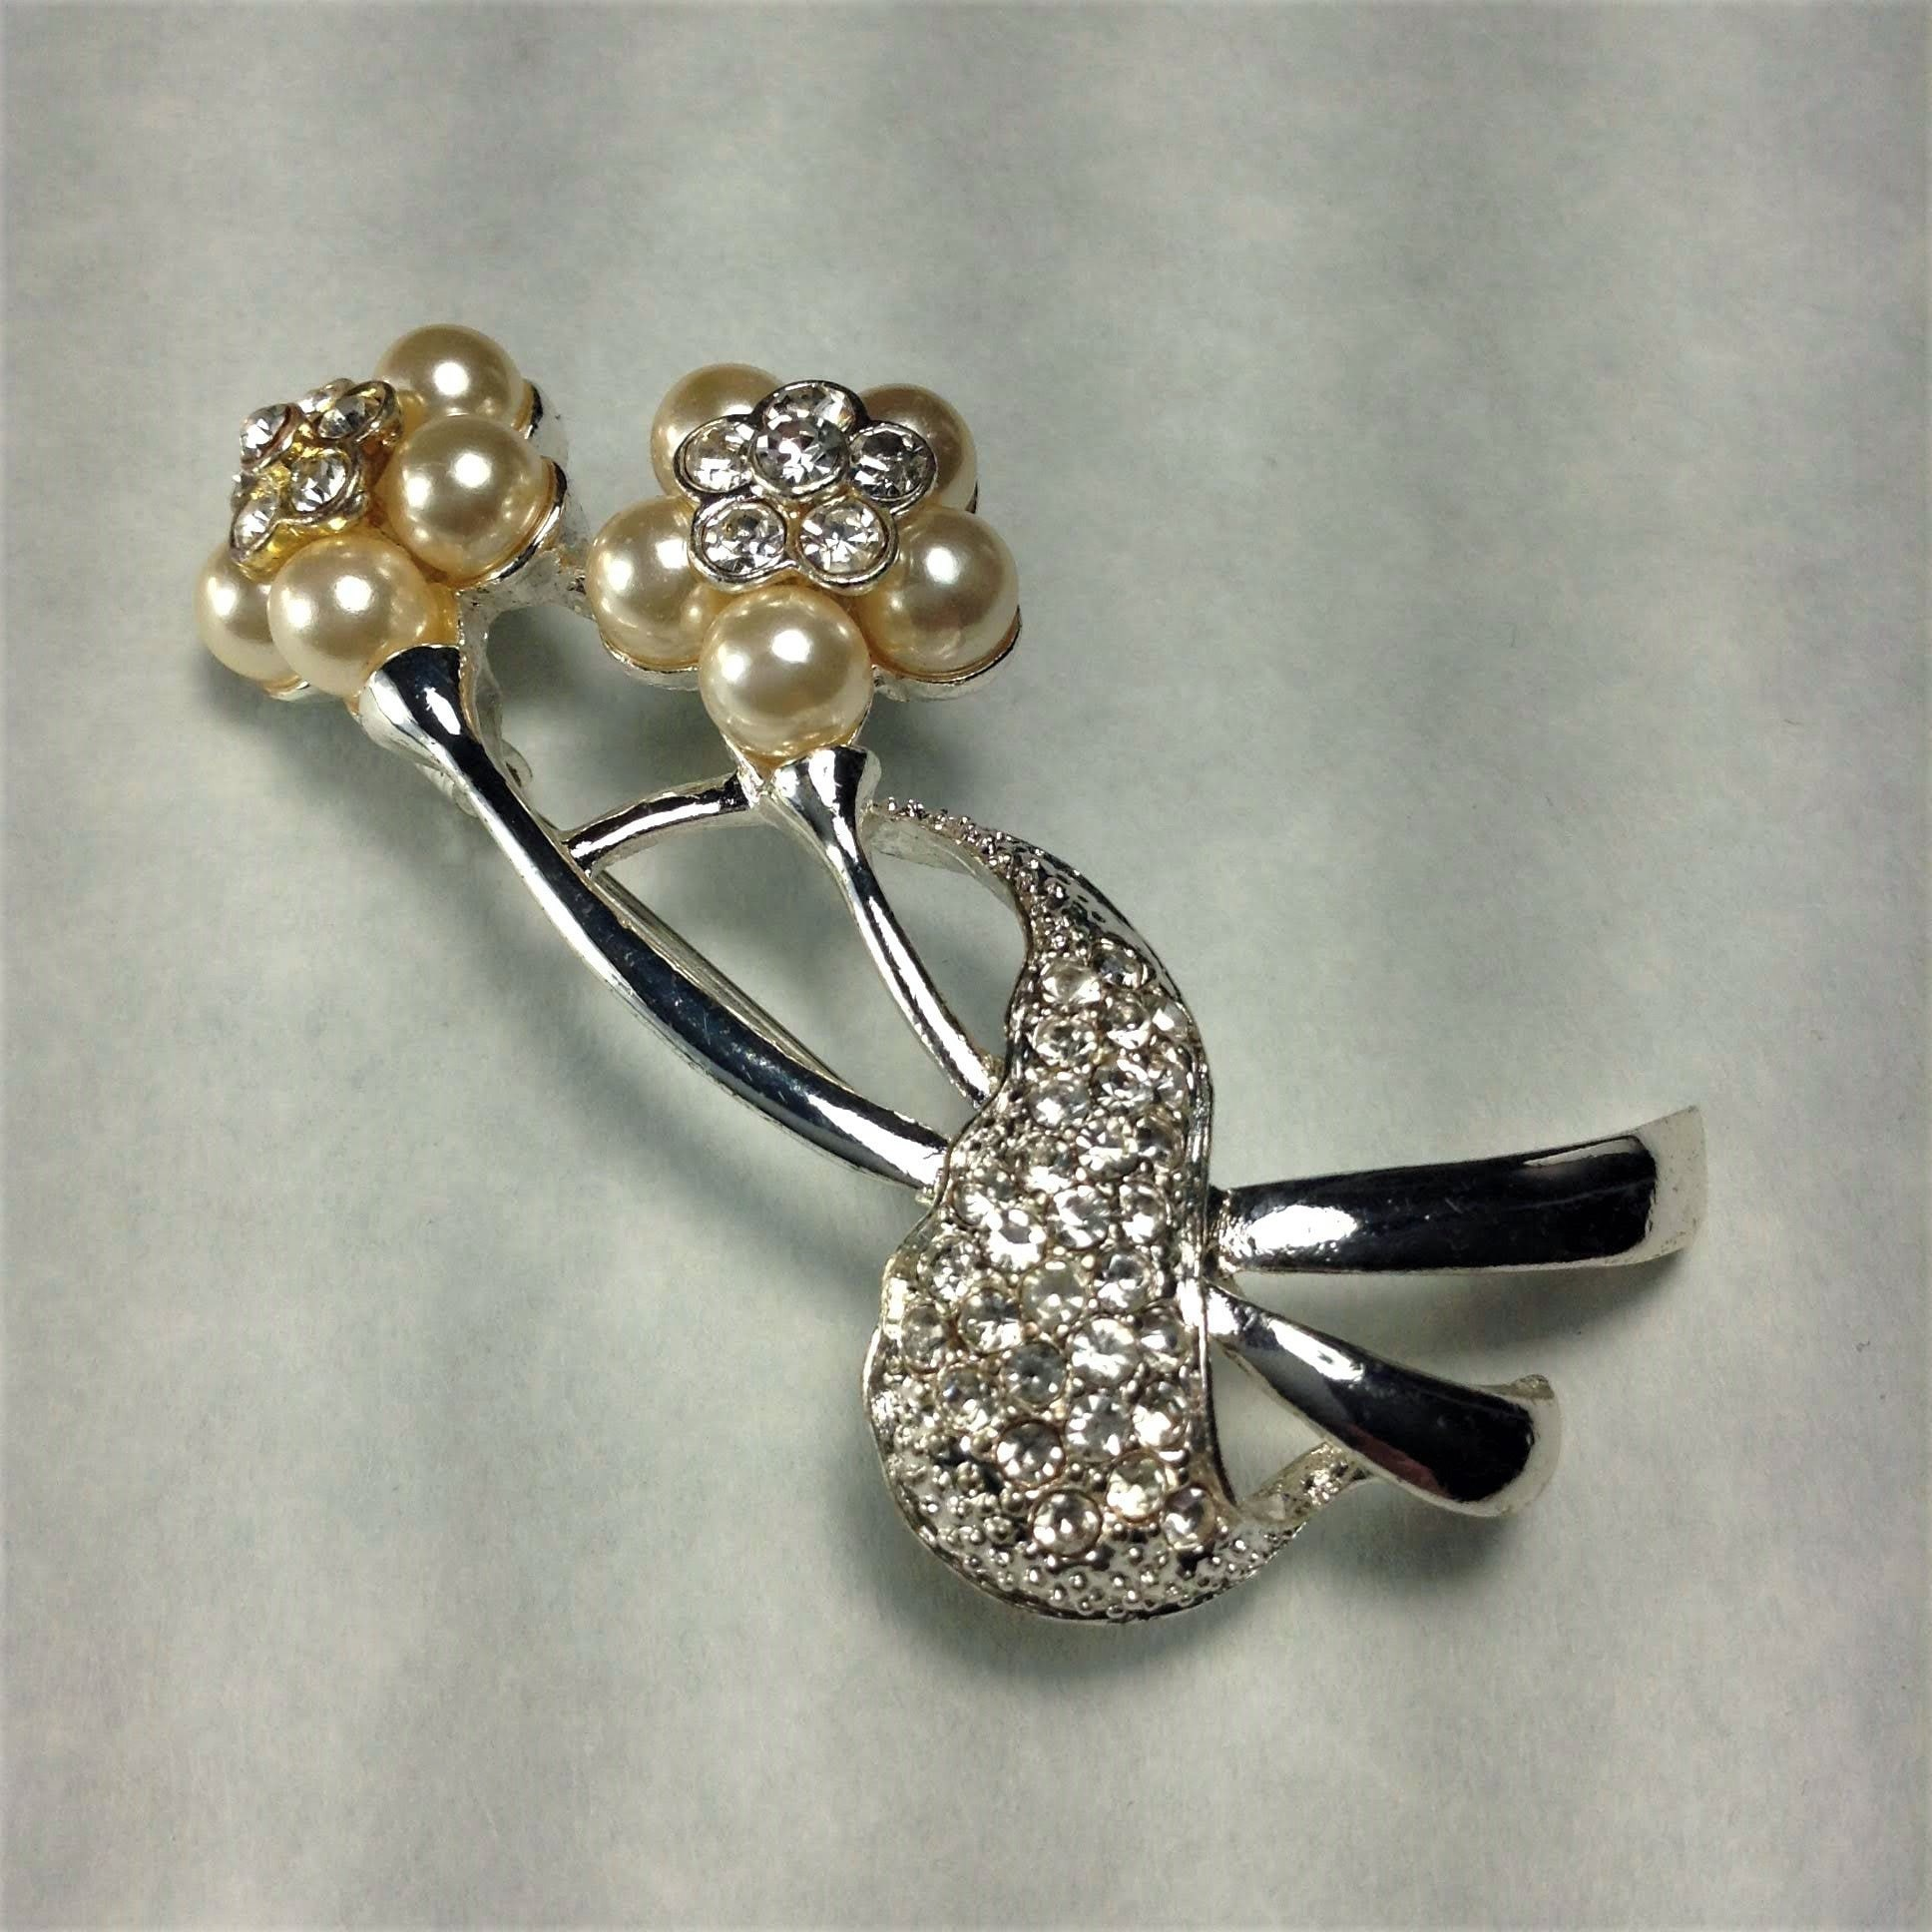 Vintage Flower Brooch 2 Silver Toned Daisy Flower Jewelry Faux Pearl /& Rhinestone 2 Flower Floral Brooch Figural Daisy Pin